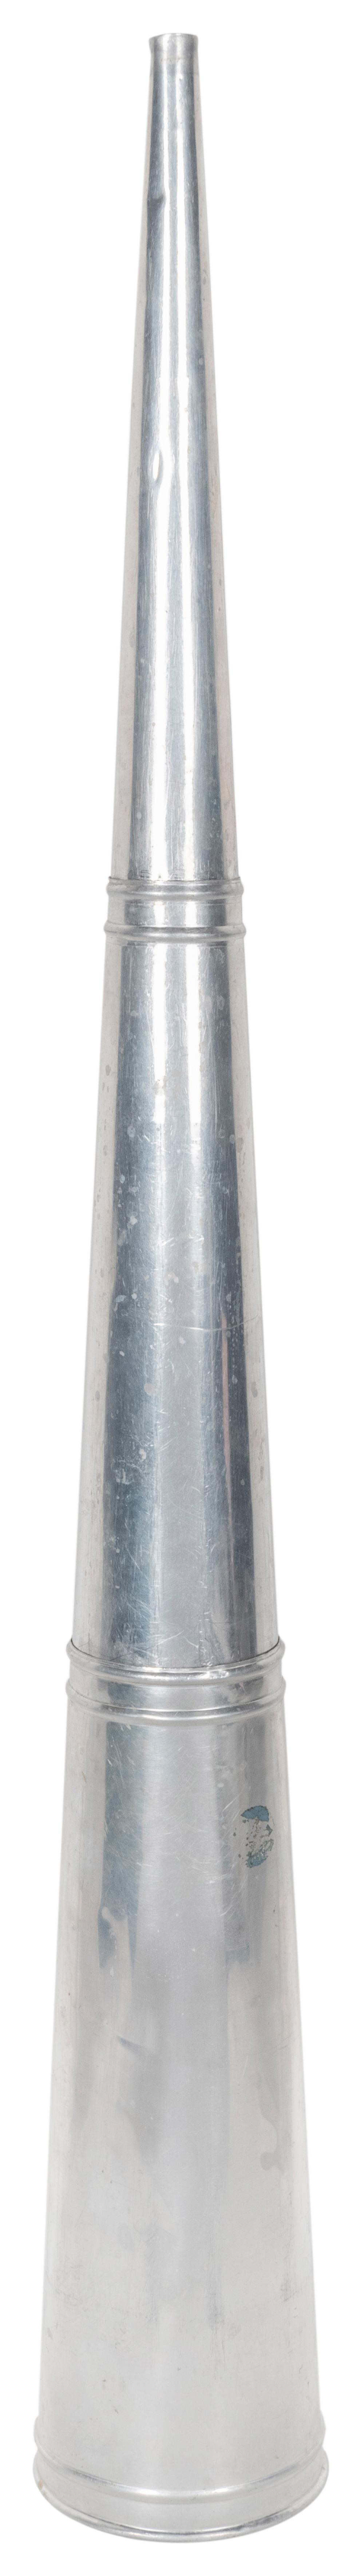 SPIRIT TRUMPET. CIRCA 1920. COLLAPSIBLE TRUMPET USED TO AMP...